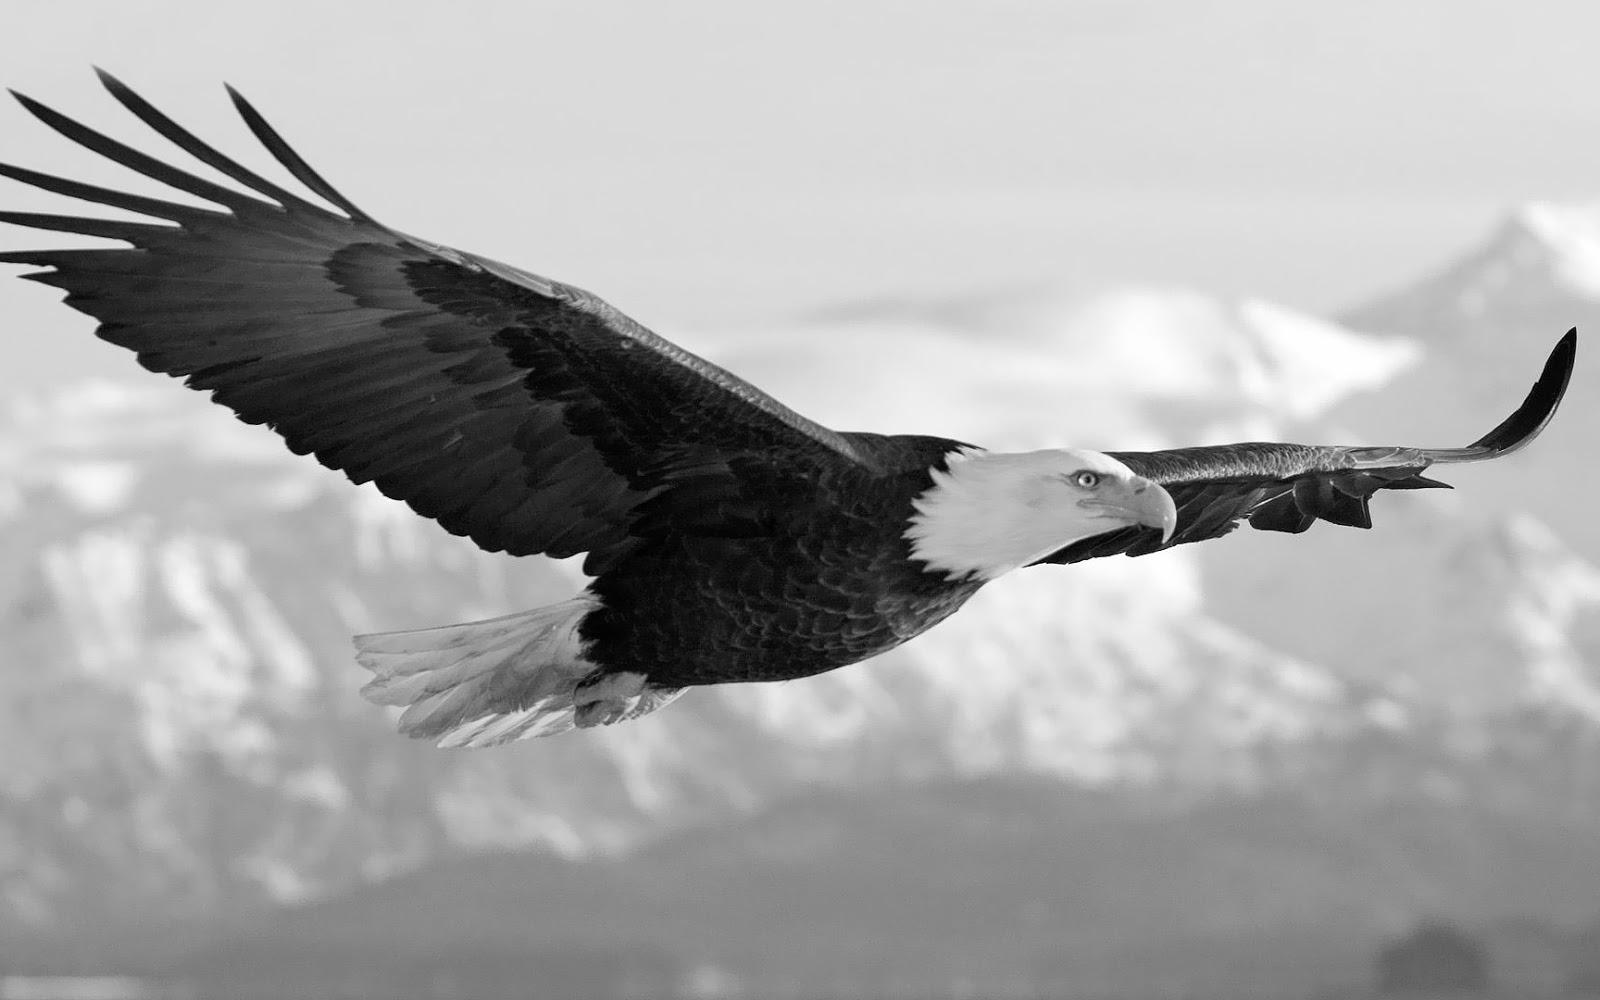 black-and-white-eagle-wallpaper jpgWhite Eagle Wallpaper